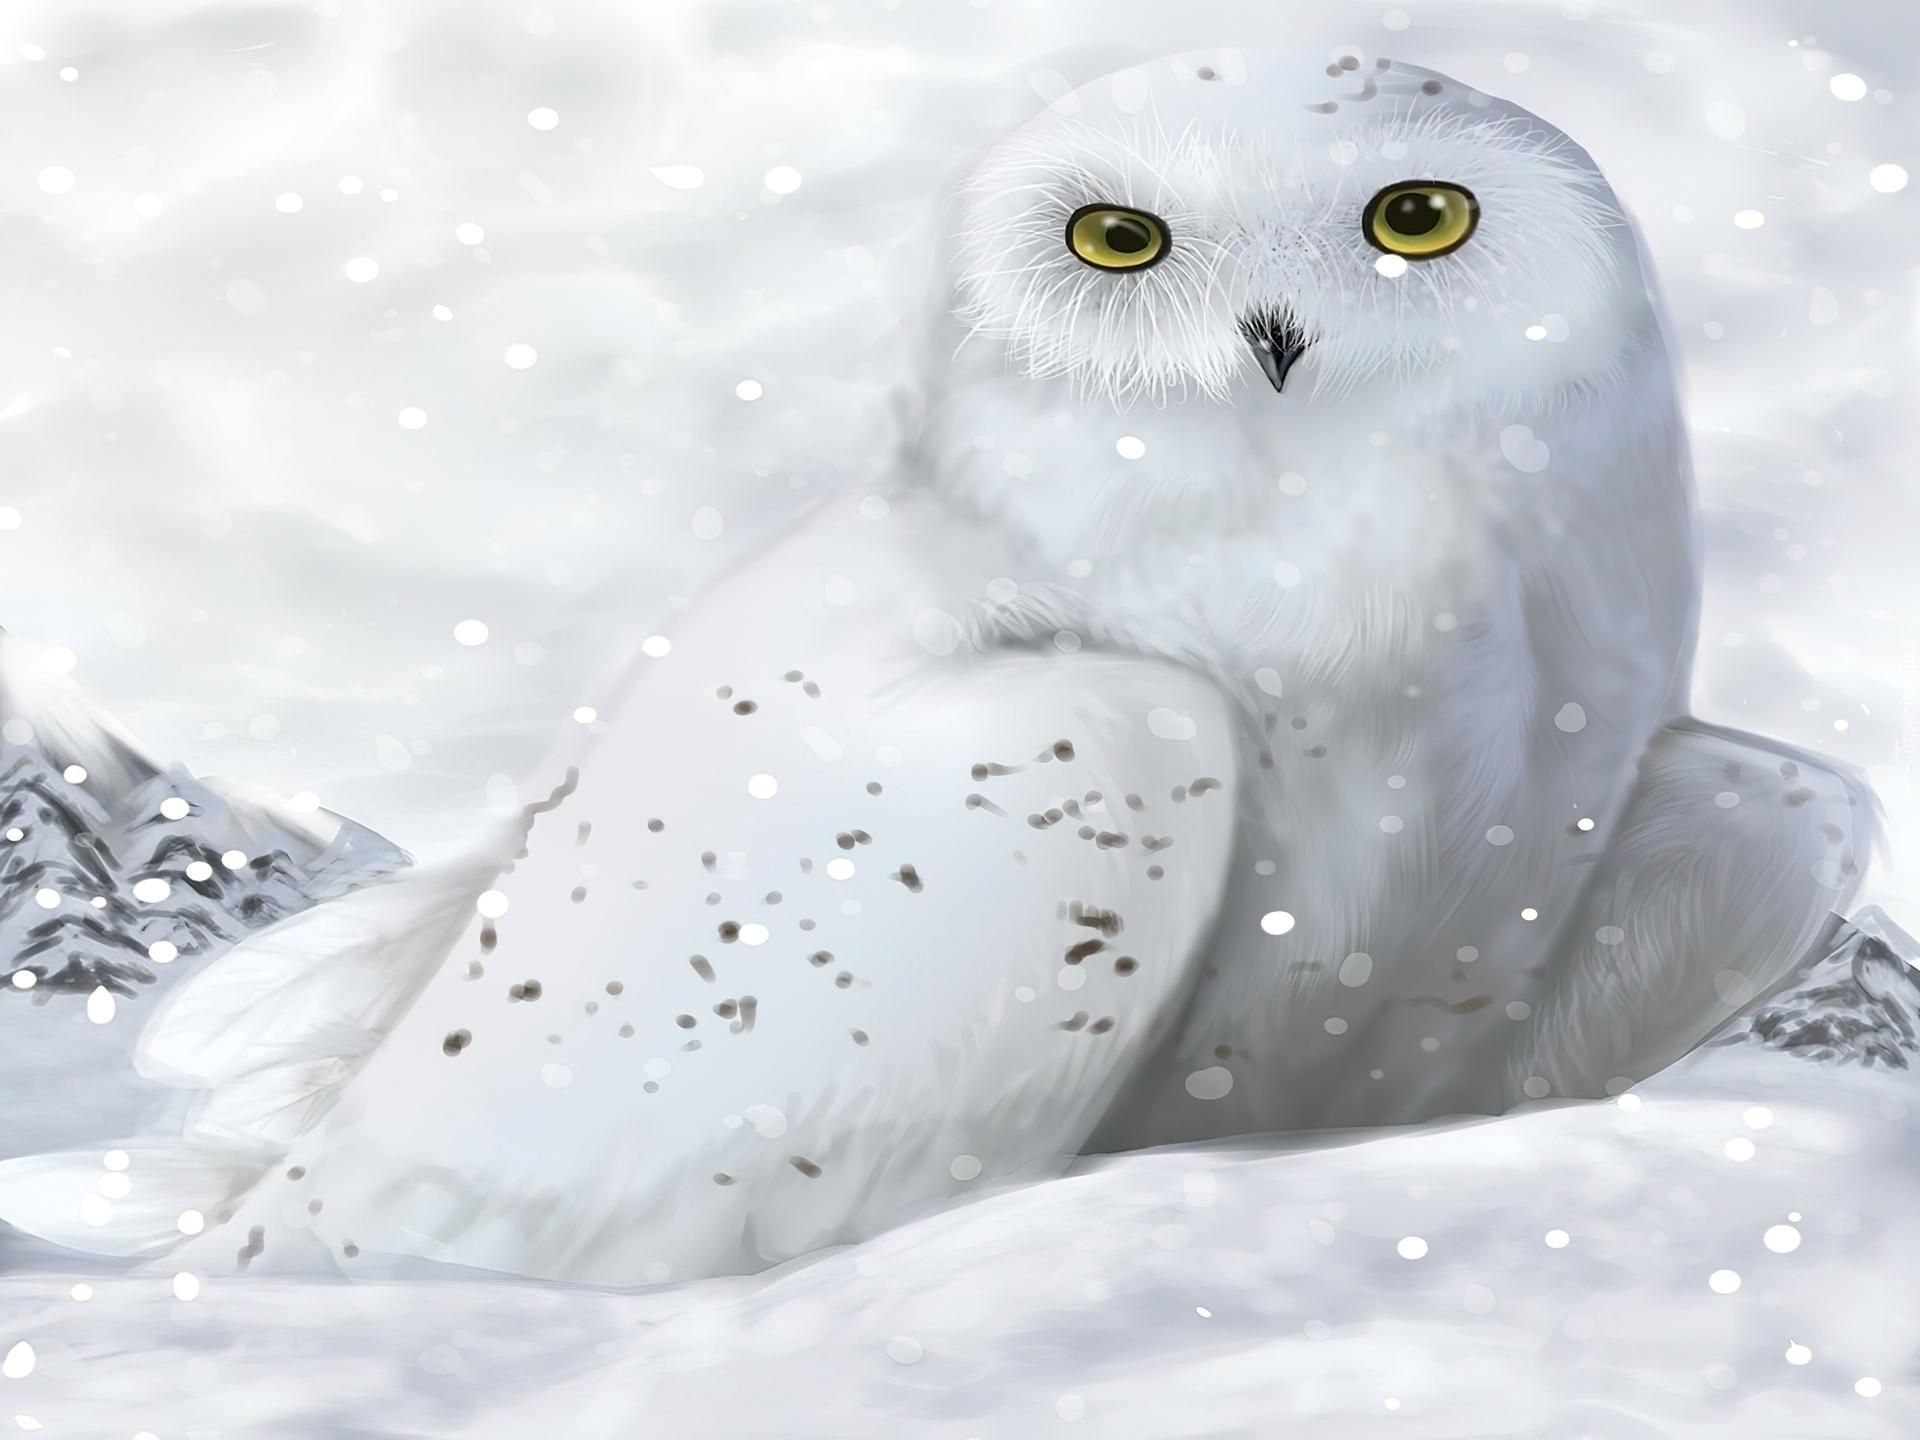 owl winter bird animal - photo #25